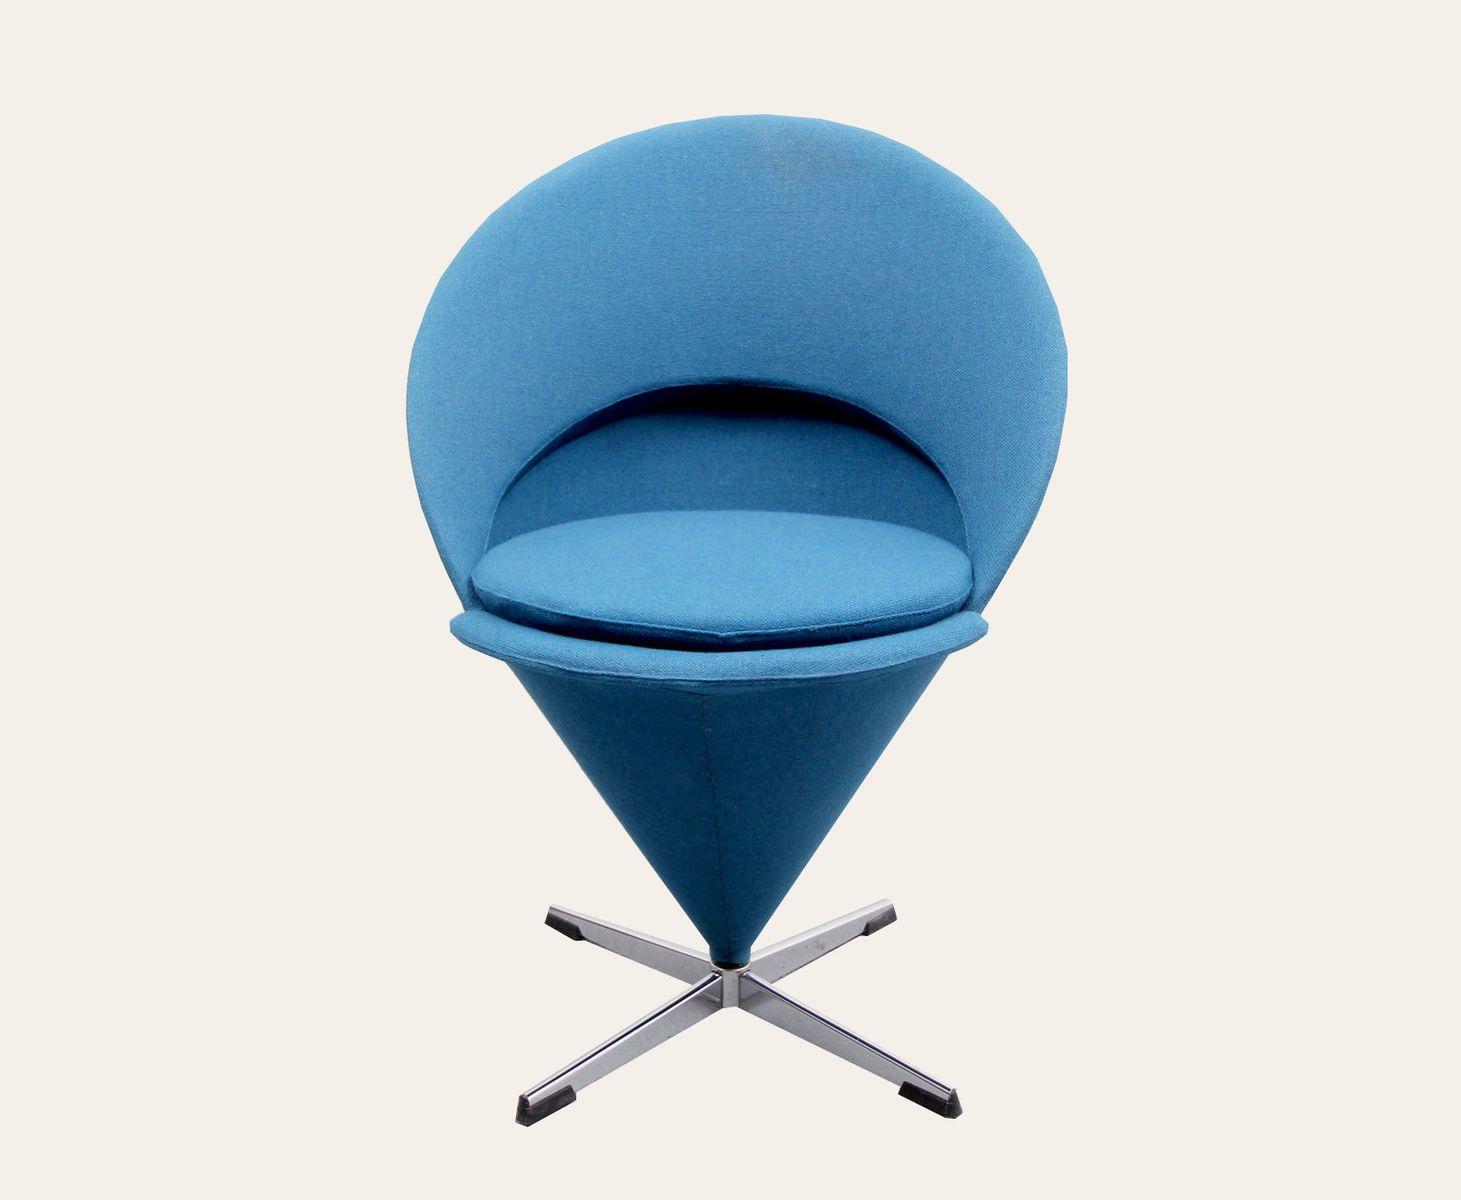 eist te cone von verner panton blau petrol bei pamono kaufen. Black Bedroom Furniture Sets. Home Design Ideas